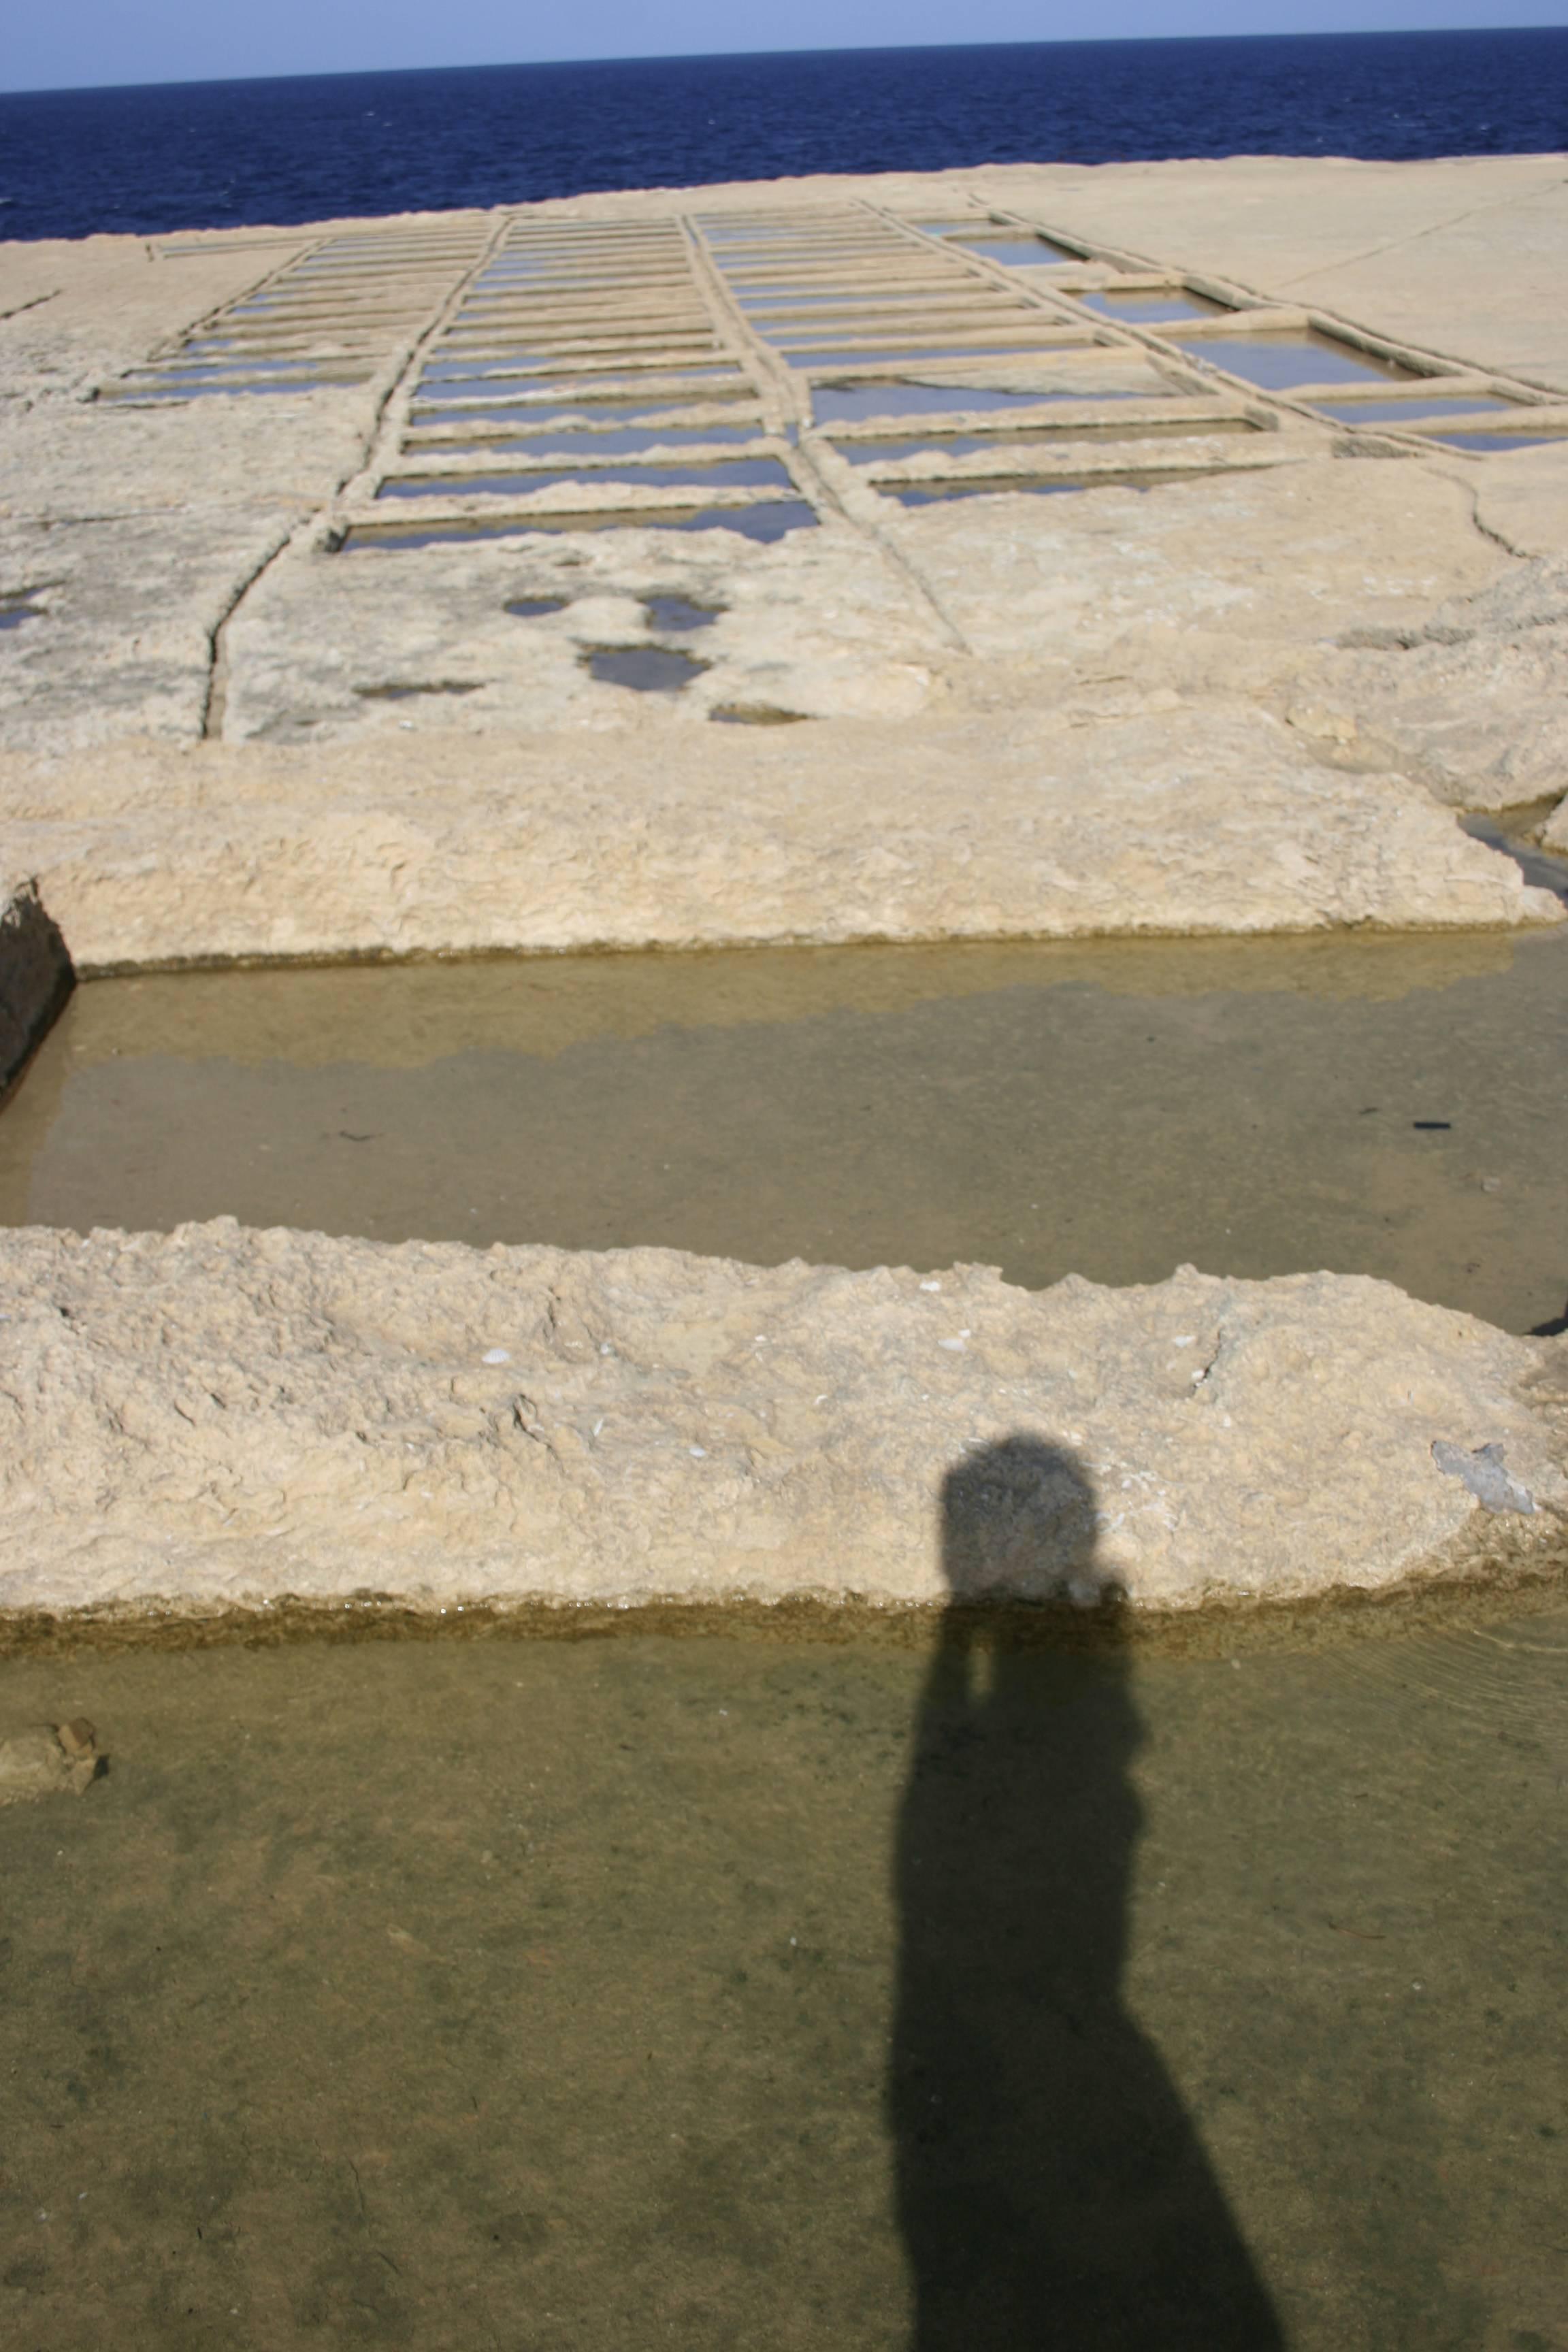 salt pans Marsalforn Gozo Malte octobre 2012 1